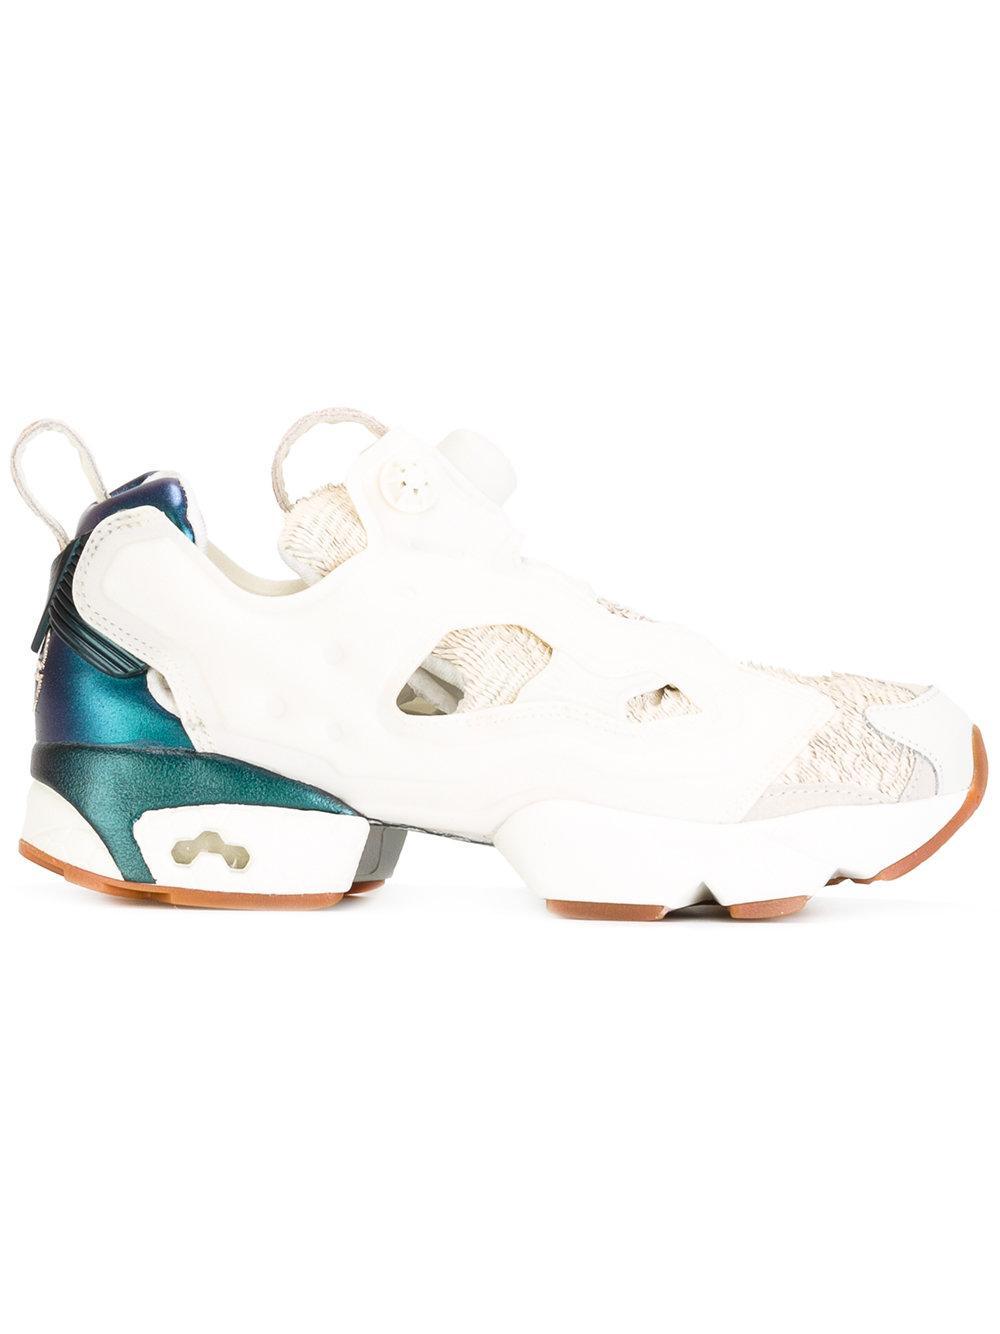 Lyst - Reebok Instapump Fury Trainers in White 02848ef16